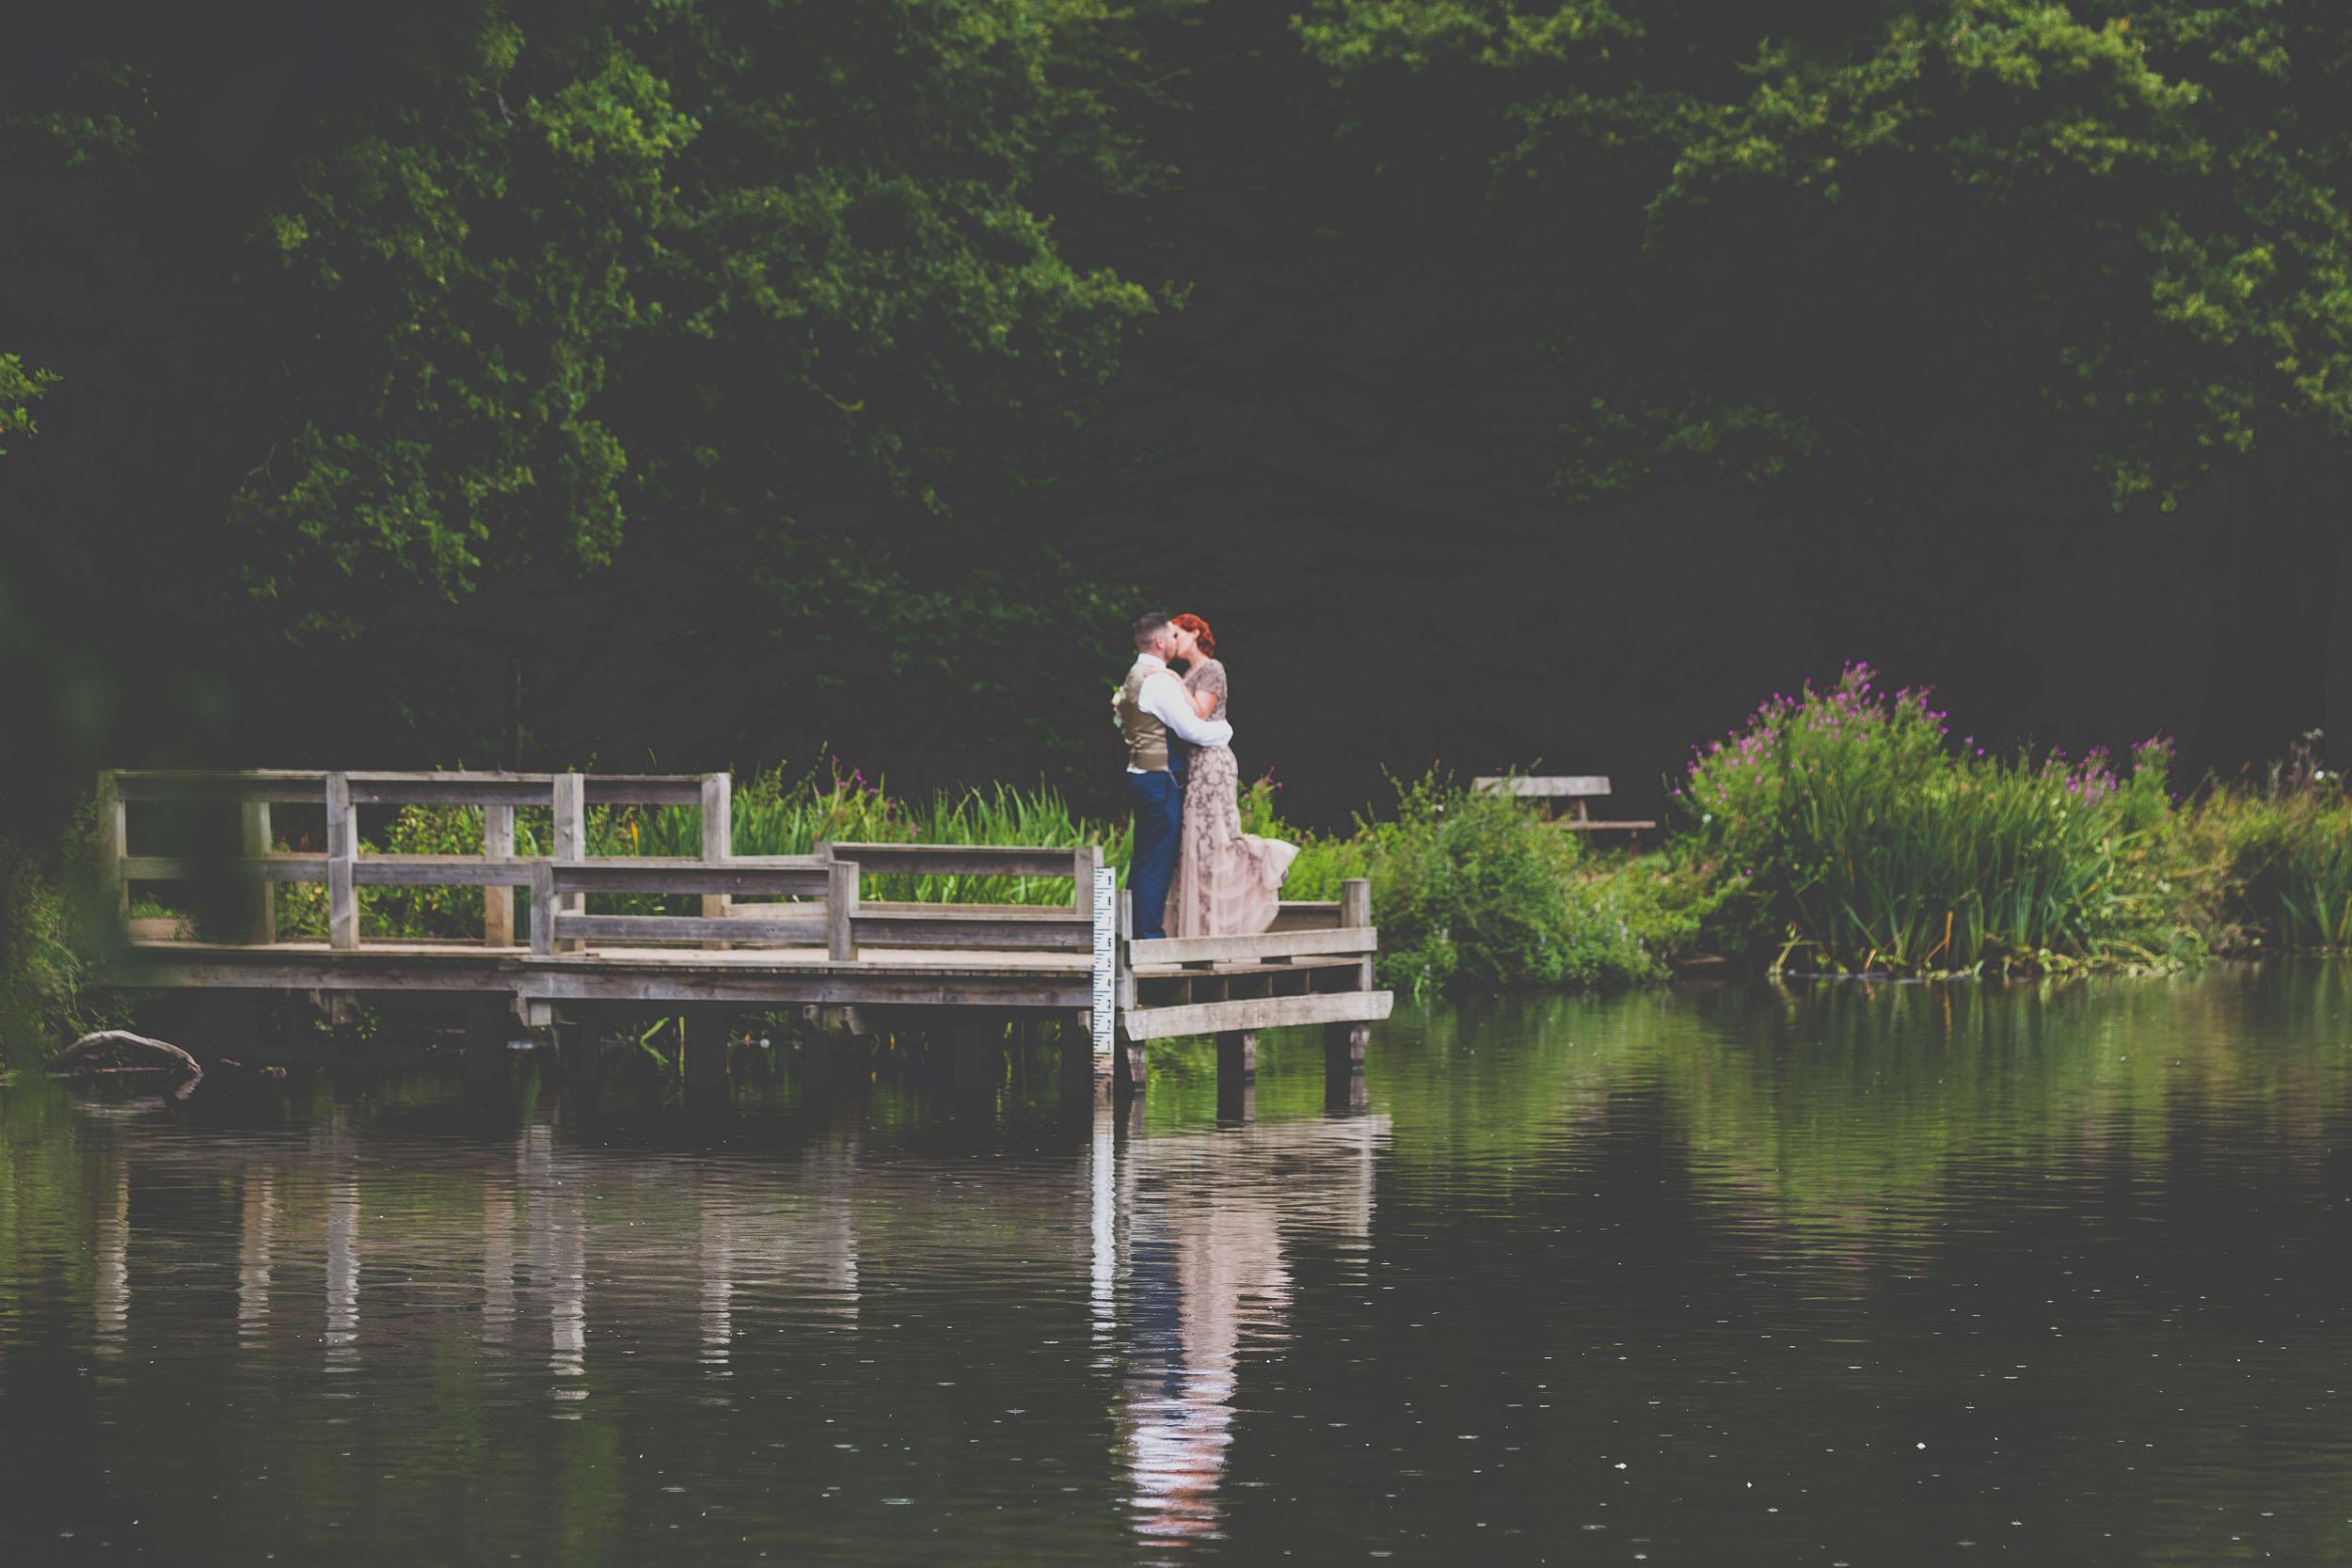 queen-elizabeths-hunting-lodge-epping-forest-wedding270.jpg